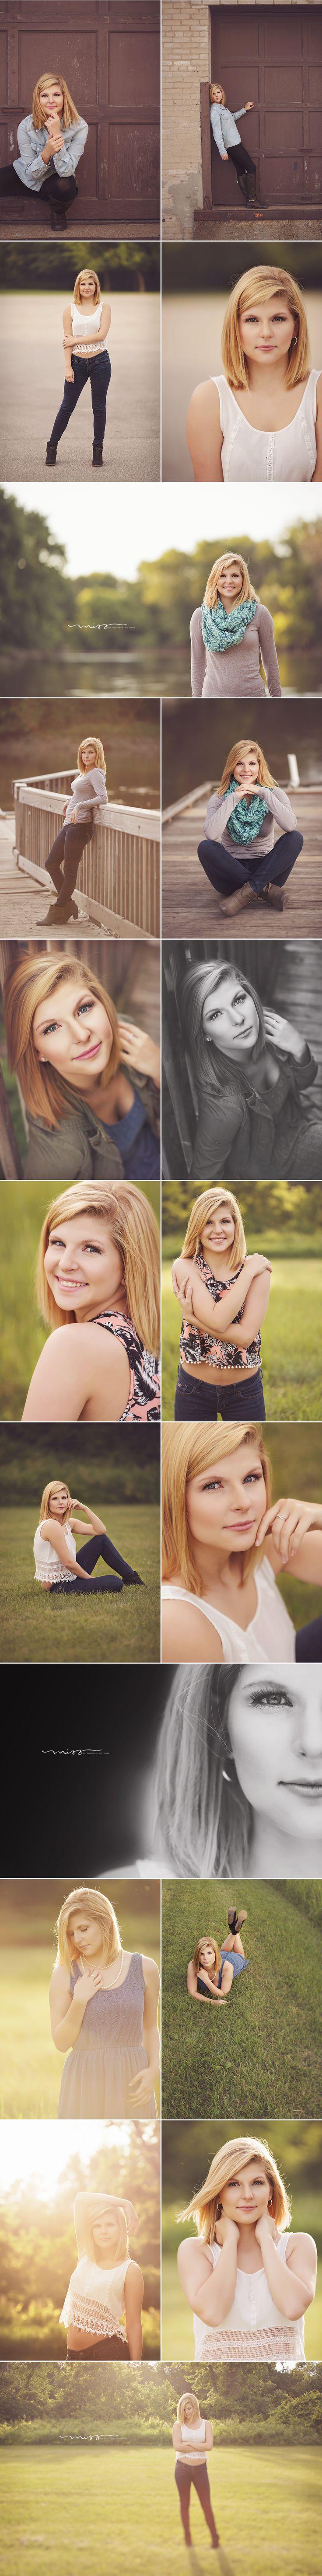 Mid Michigan High School Senior Photos | Sara 3